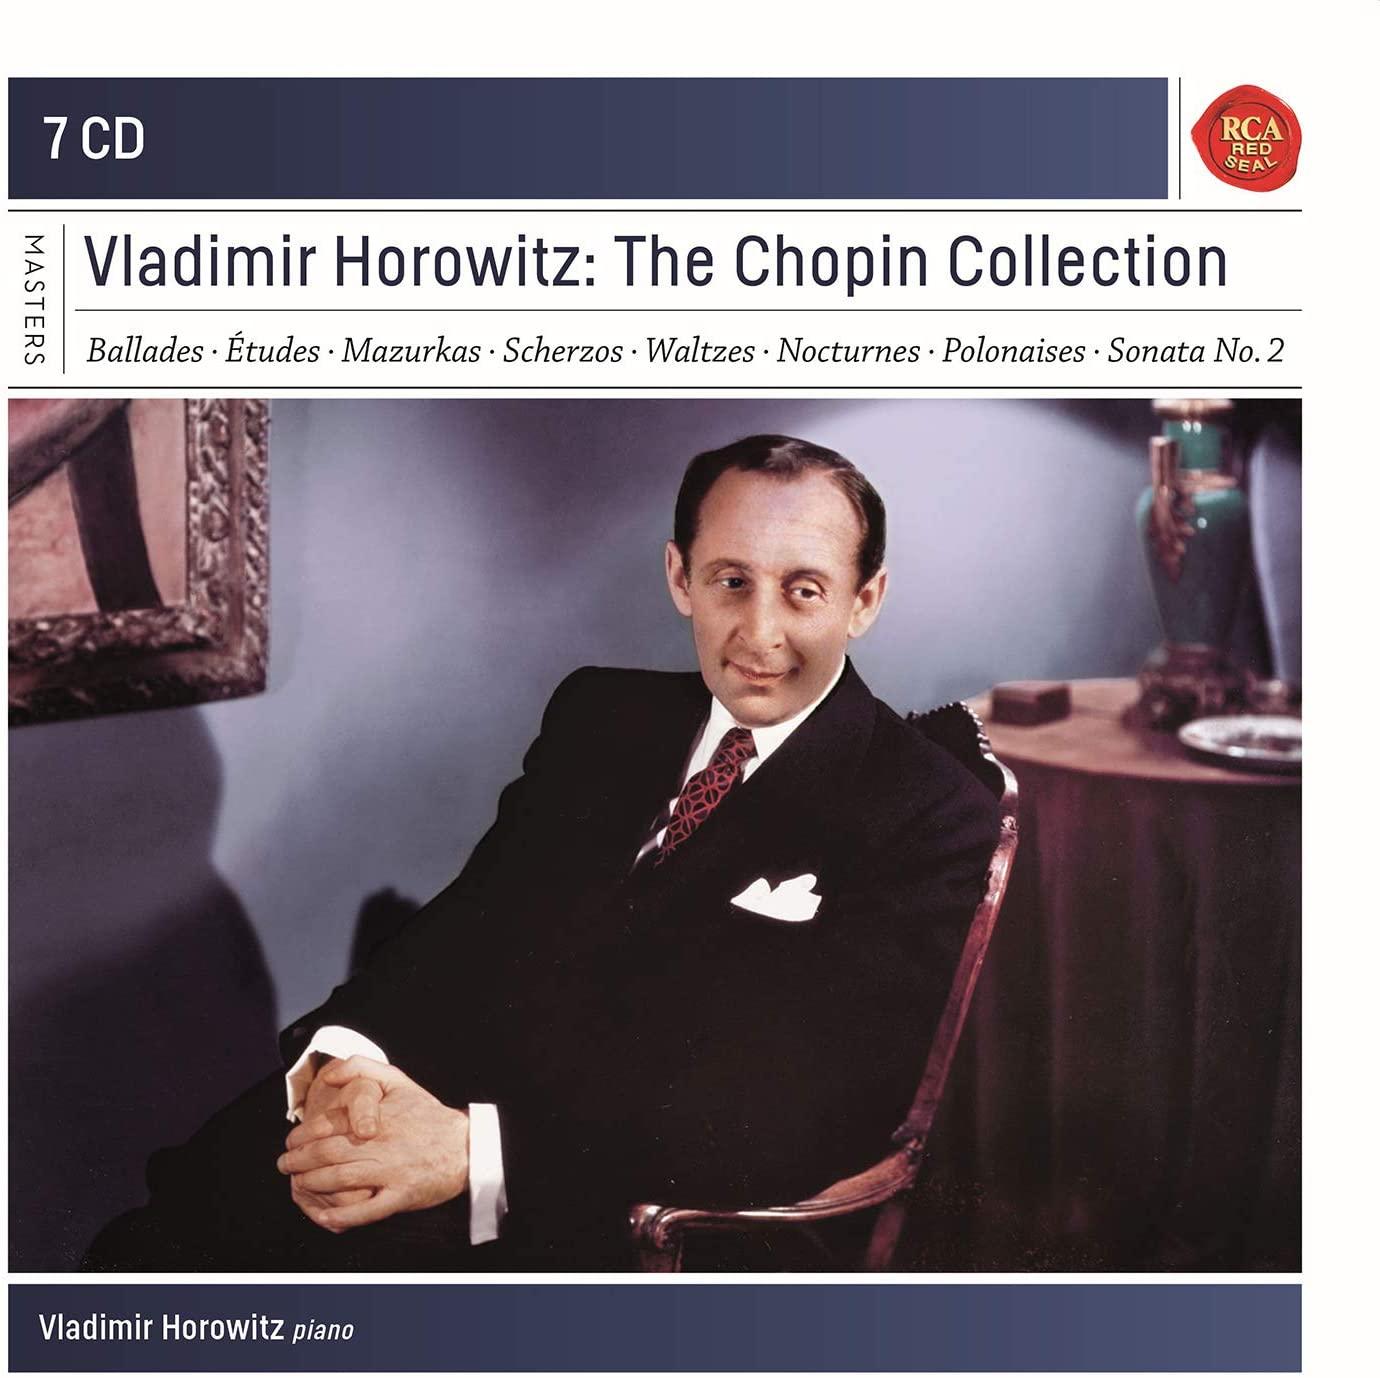 Vladimir Horowitz: The Chopin Collection (Box Set)